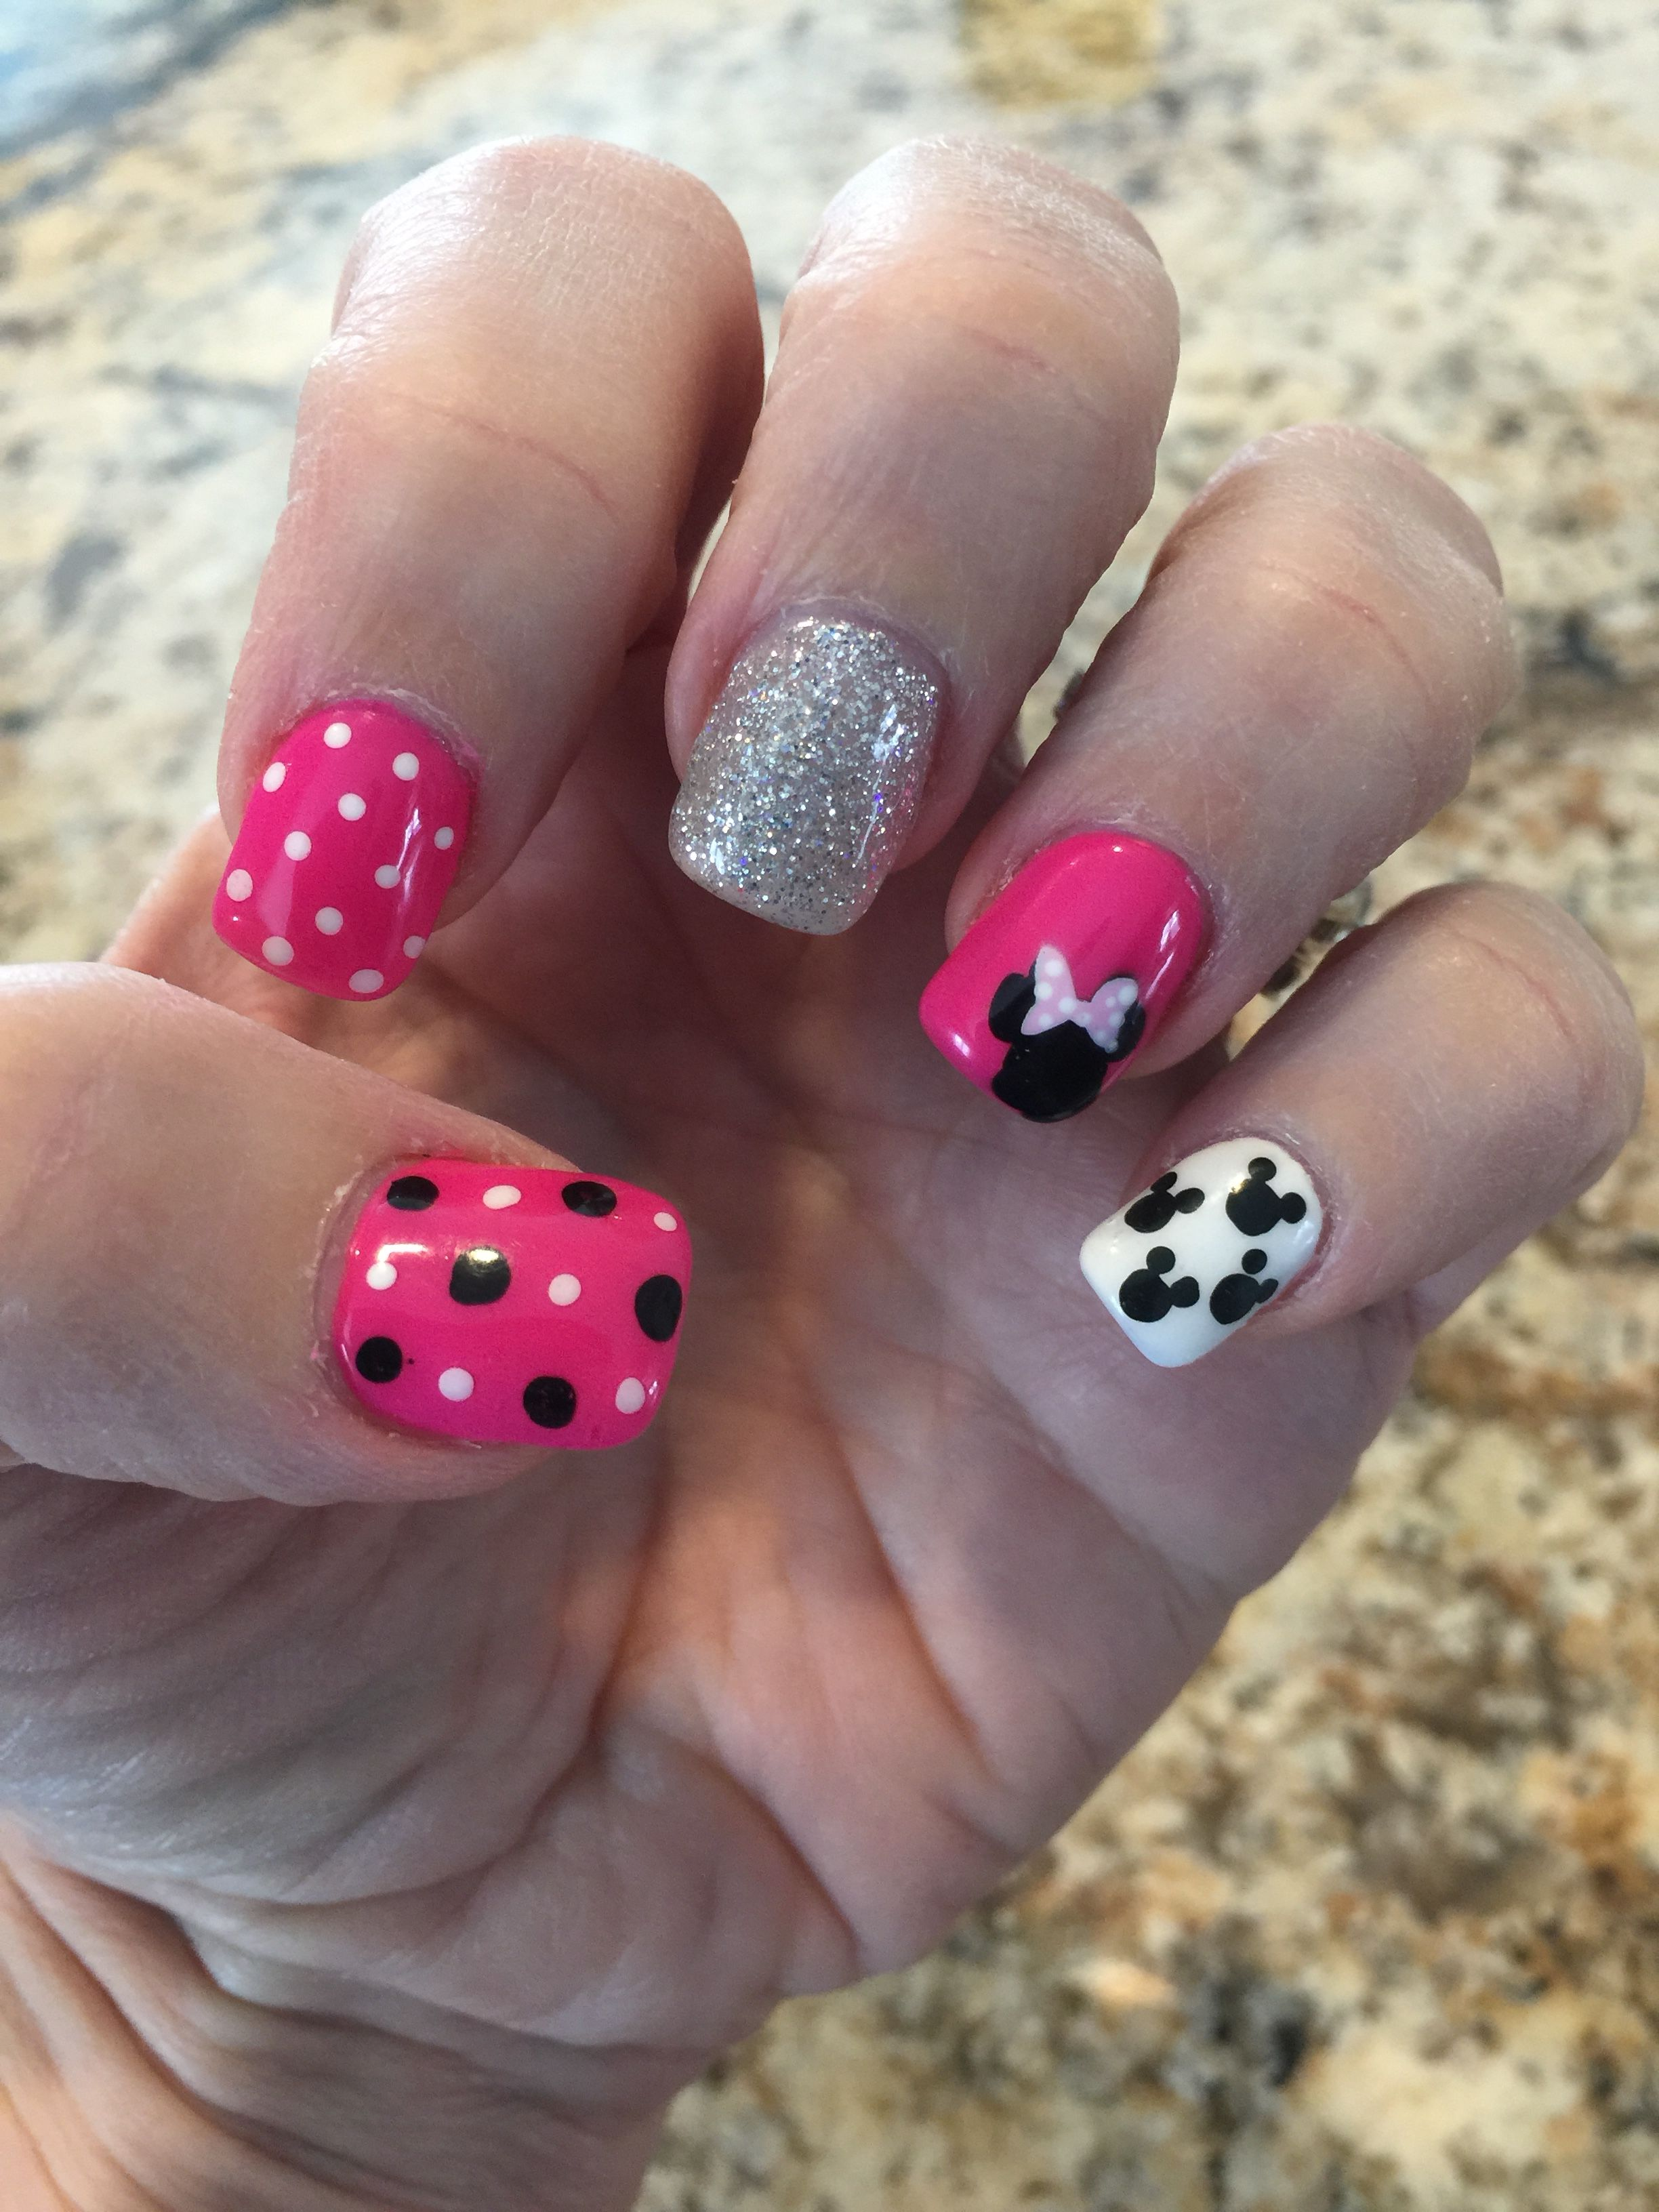 My March Disney nail design | Nails | Pinterest | Disney nageldesign ...